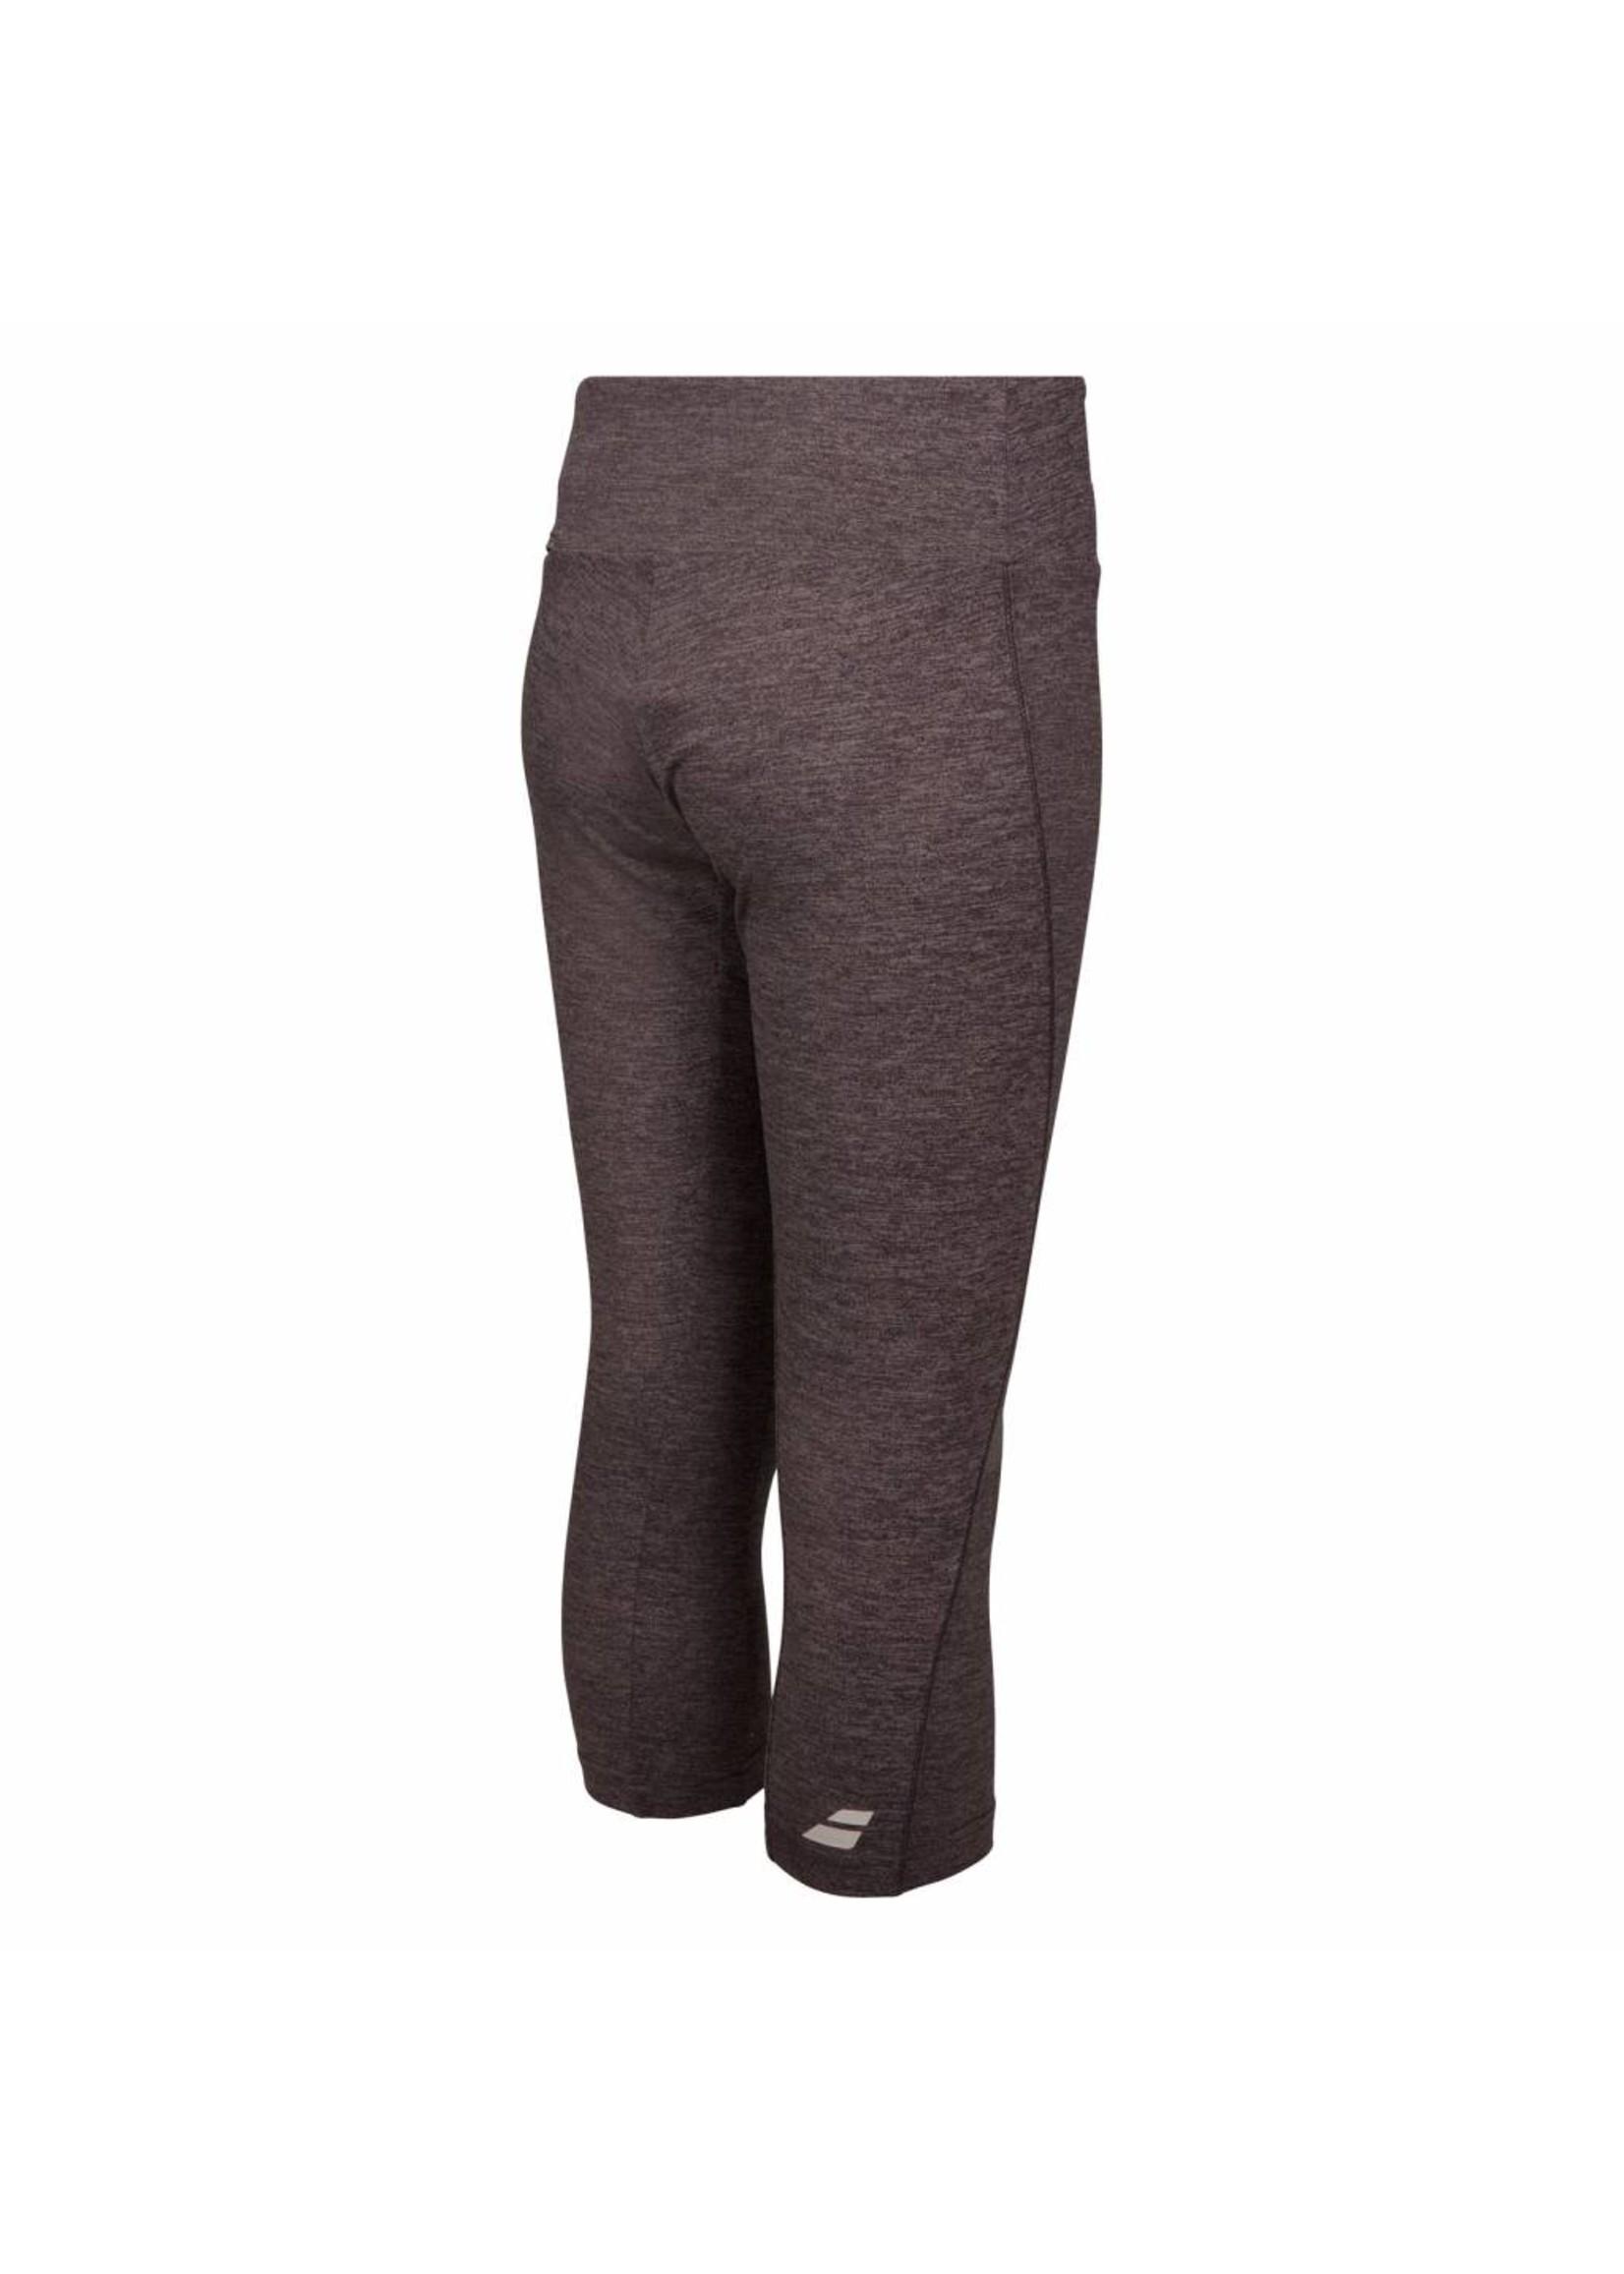 Babolat Babolat Ladies Core Legging (2017)